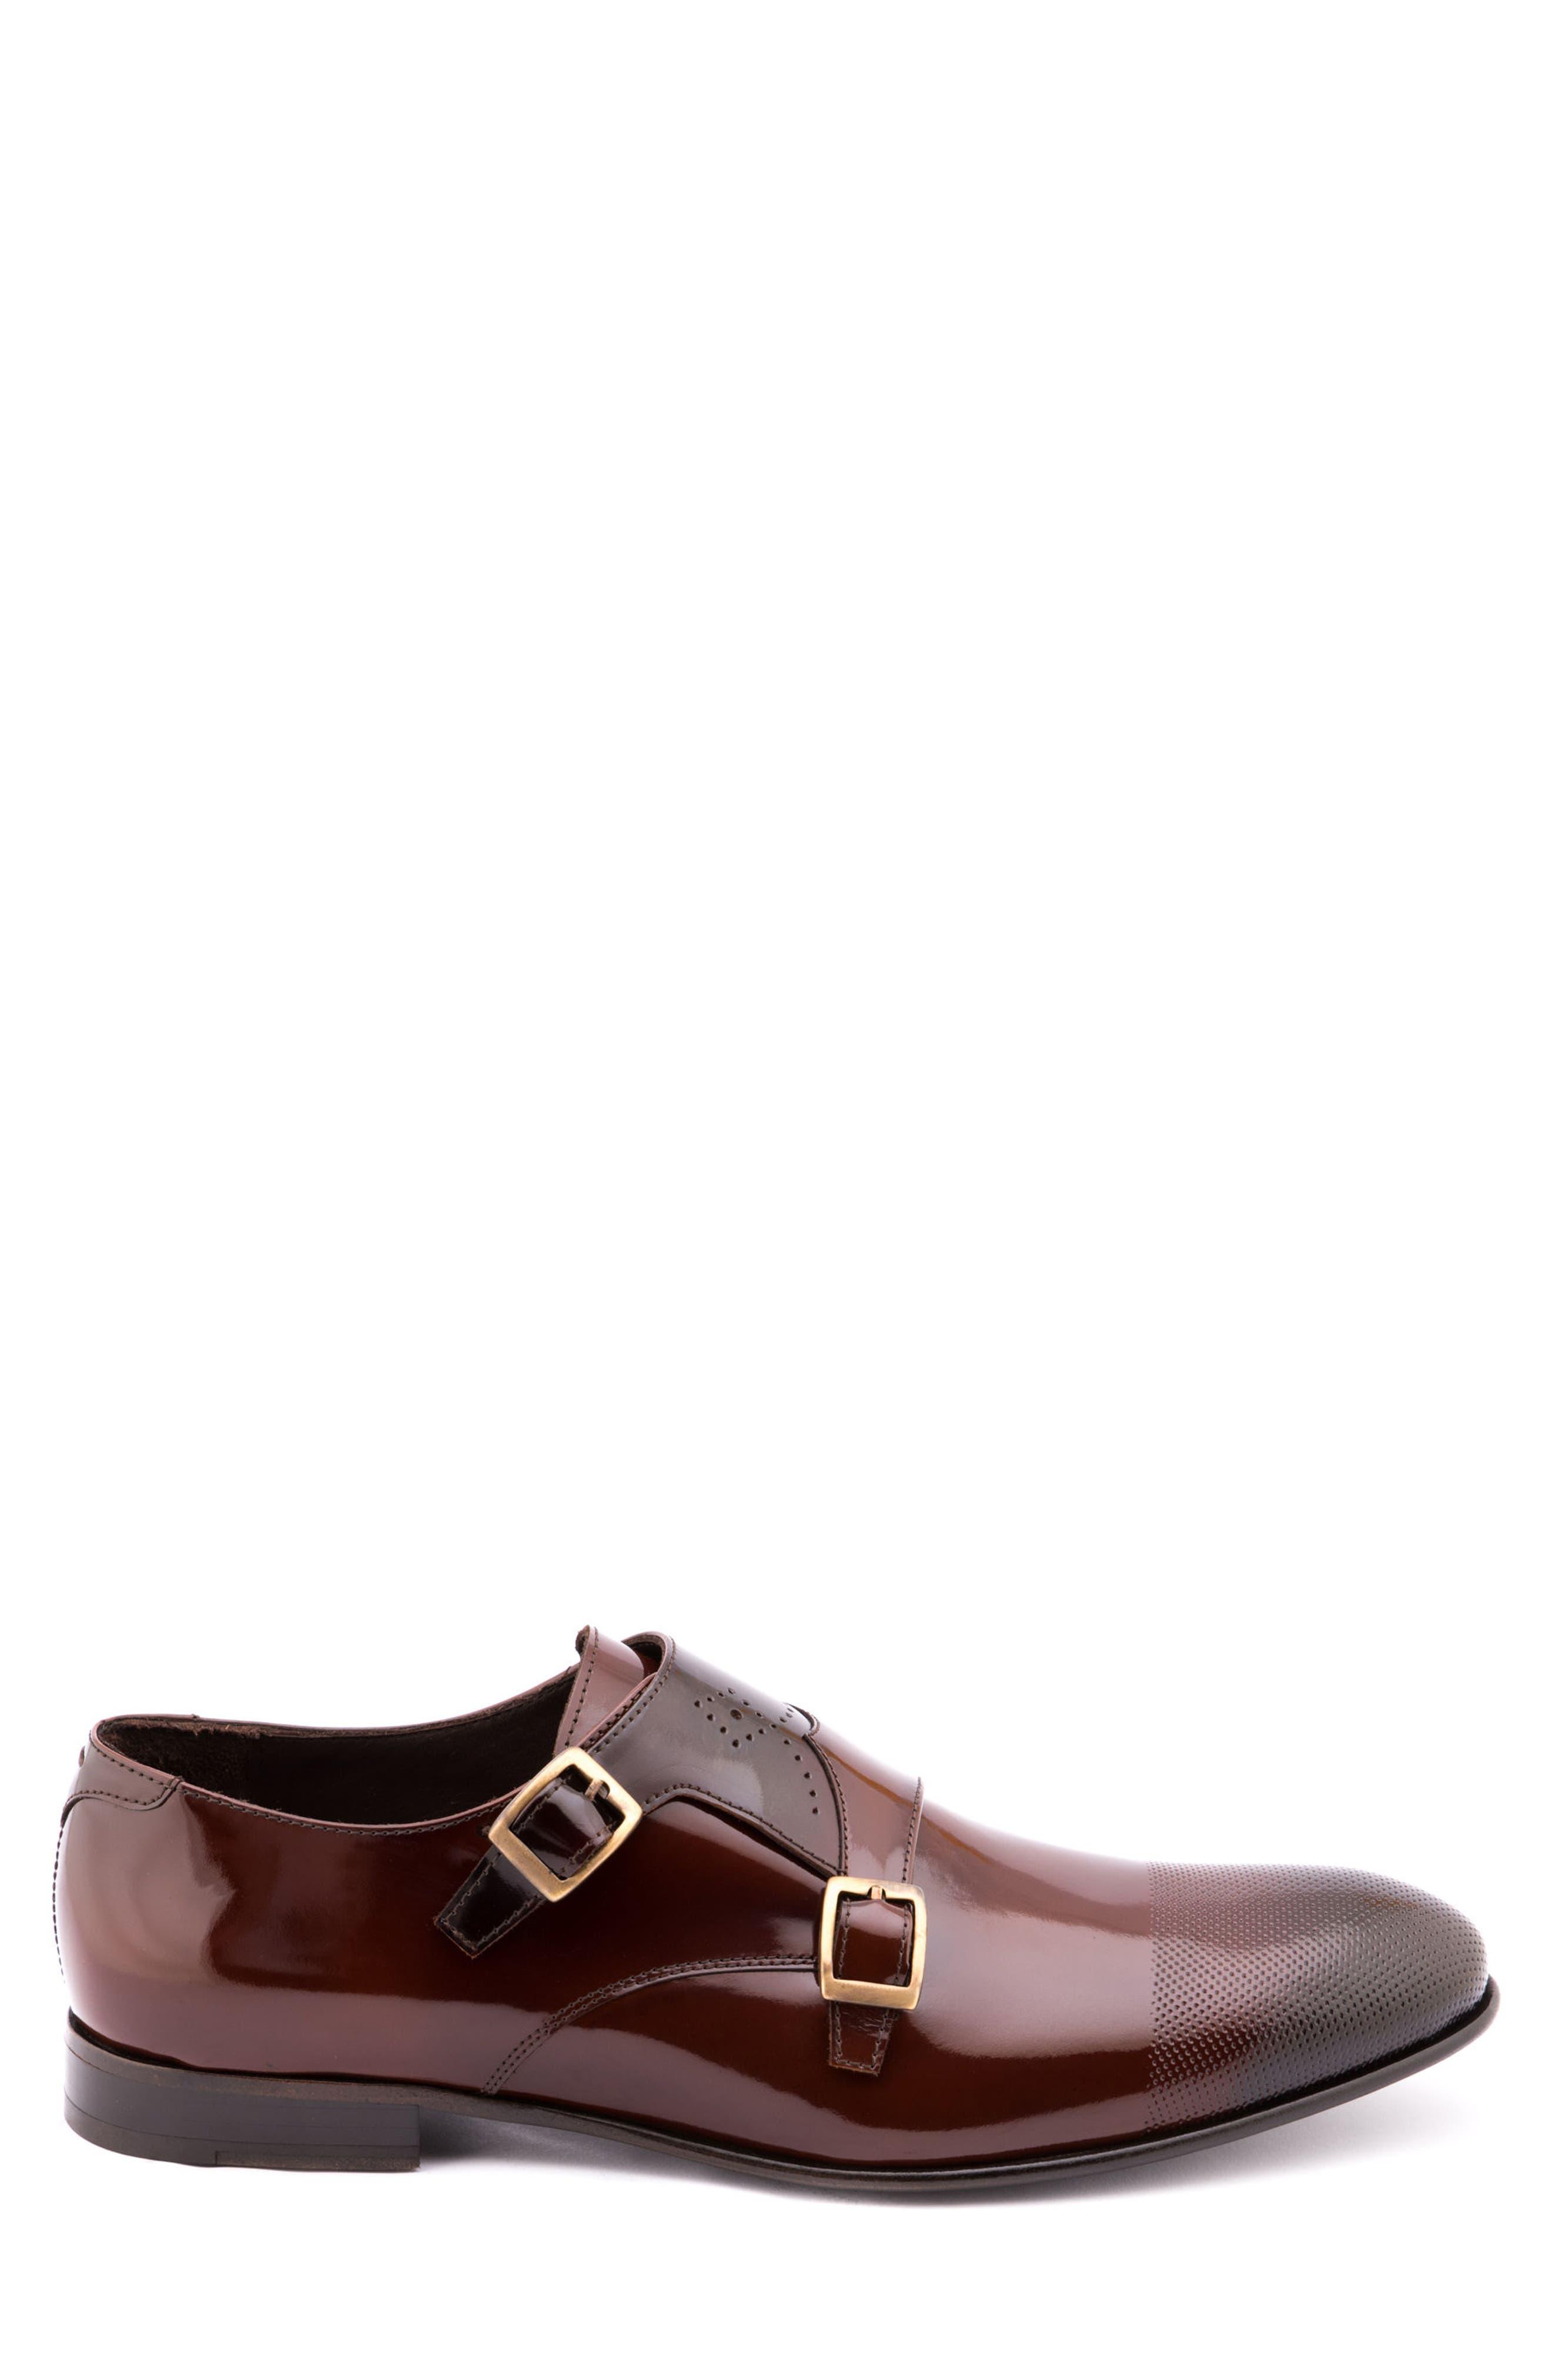 Martin Double Monk Strap Shoe,                             Alternate thumbnail 3, color,                             Brown